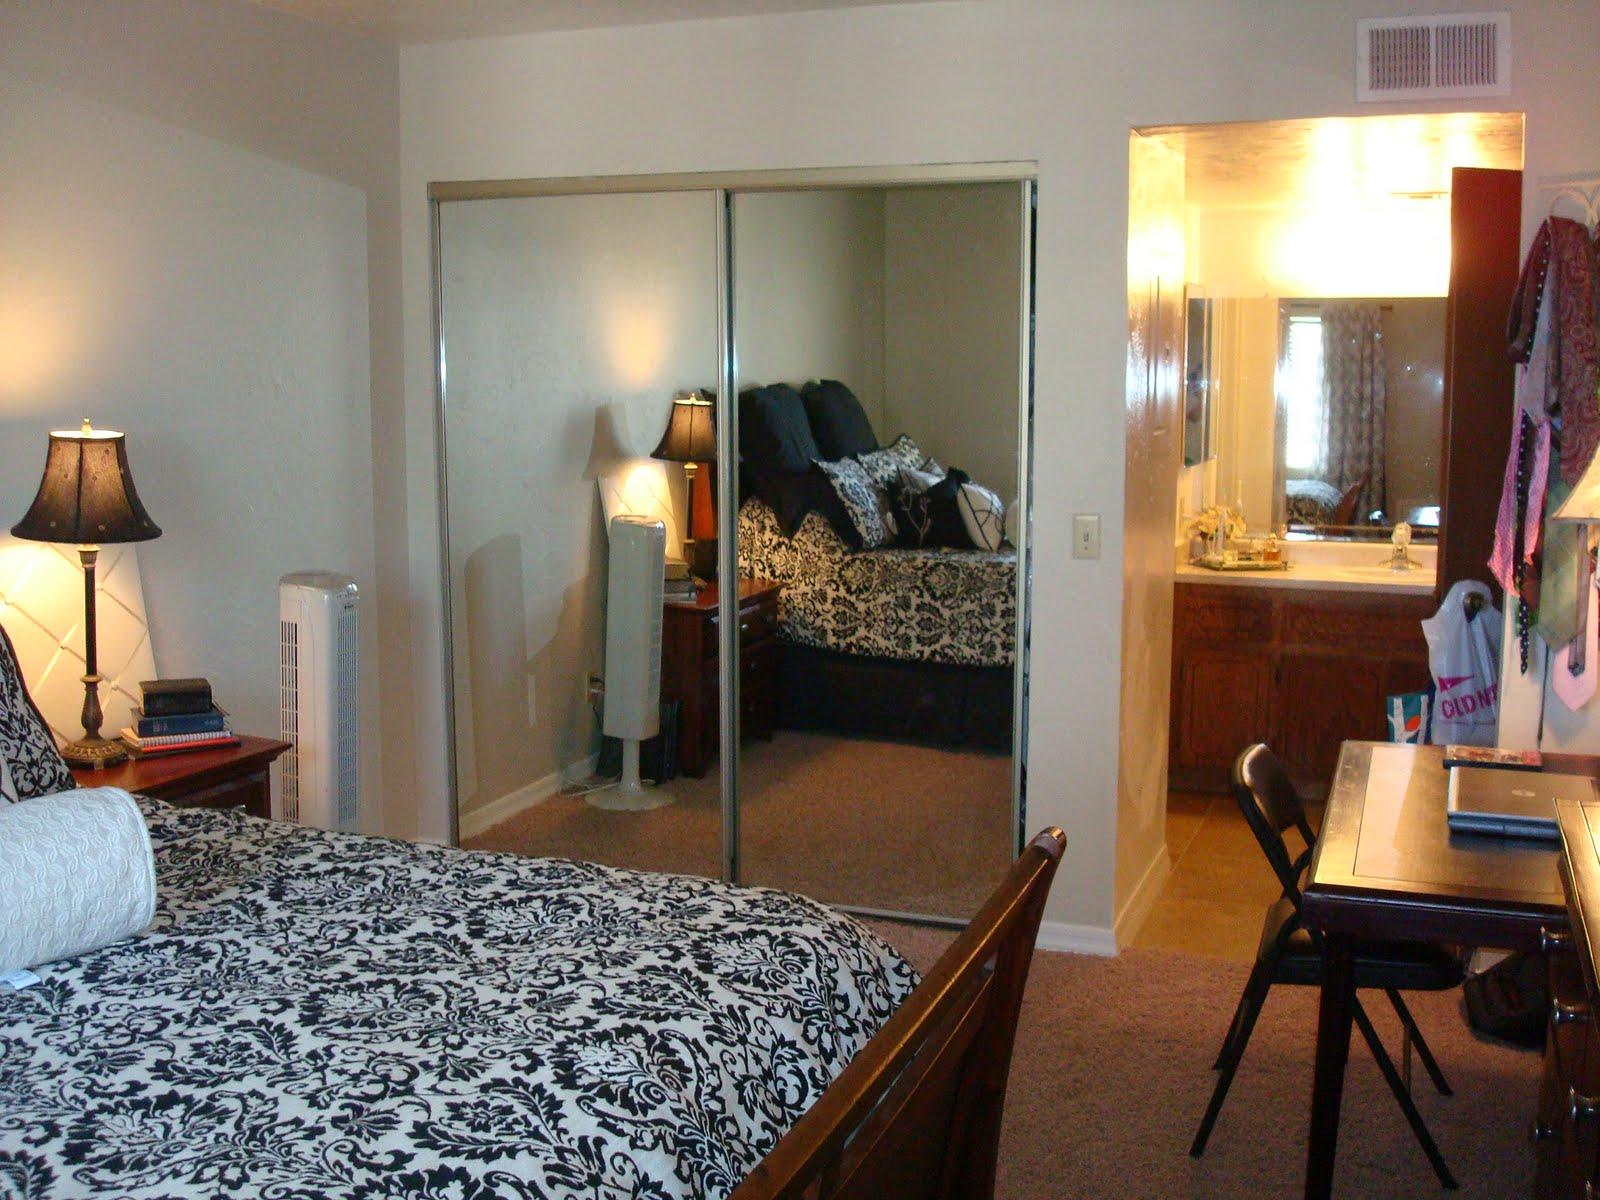 Cornerstone manor apartments - Cornerstone kitchens and bathrooms ...